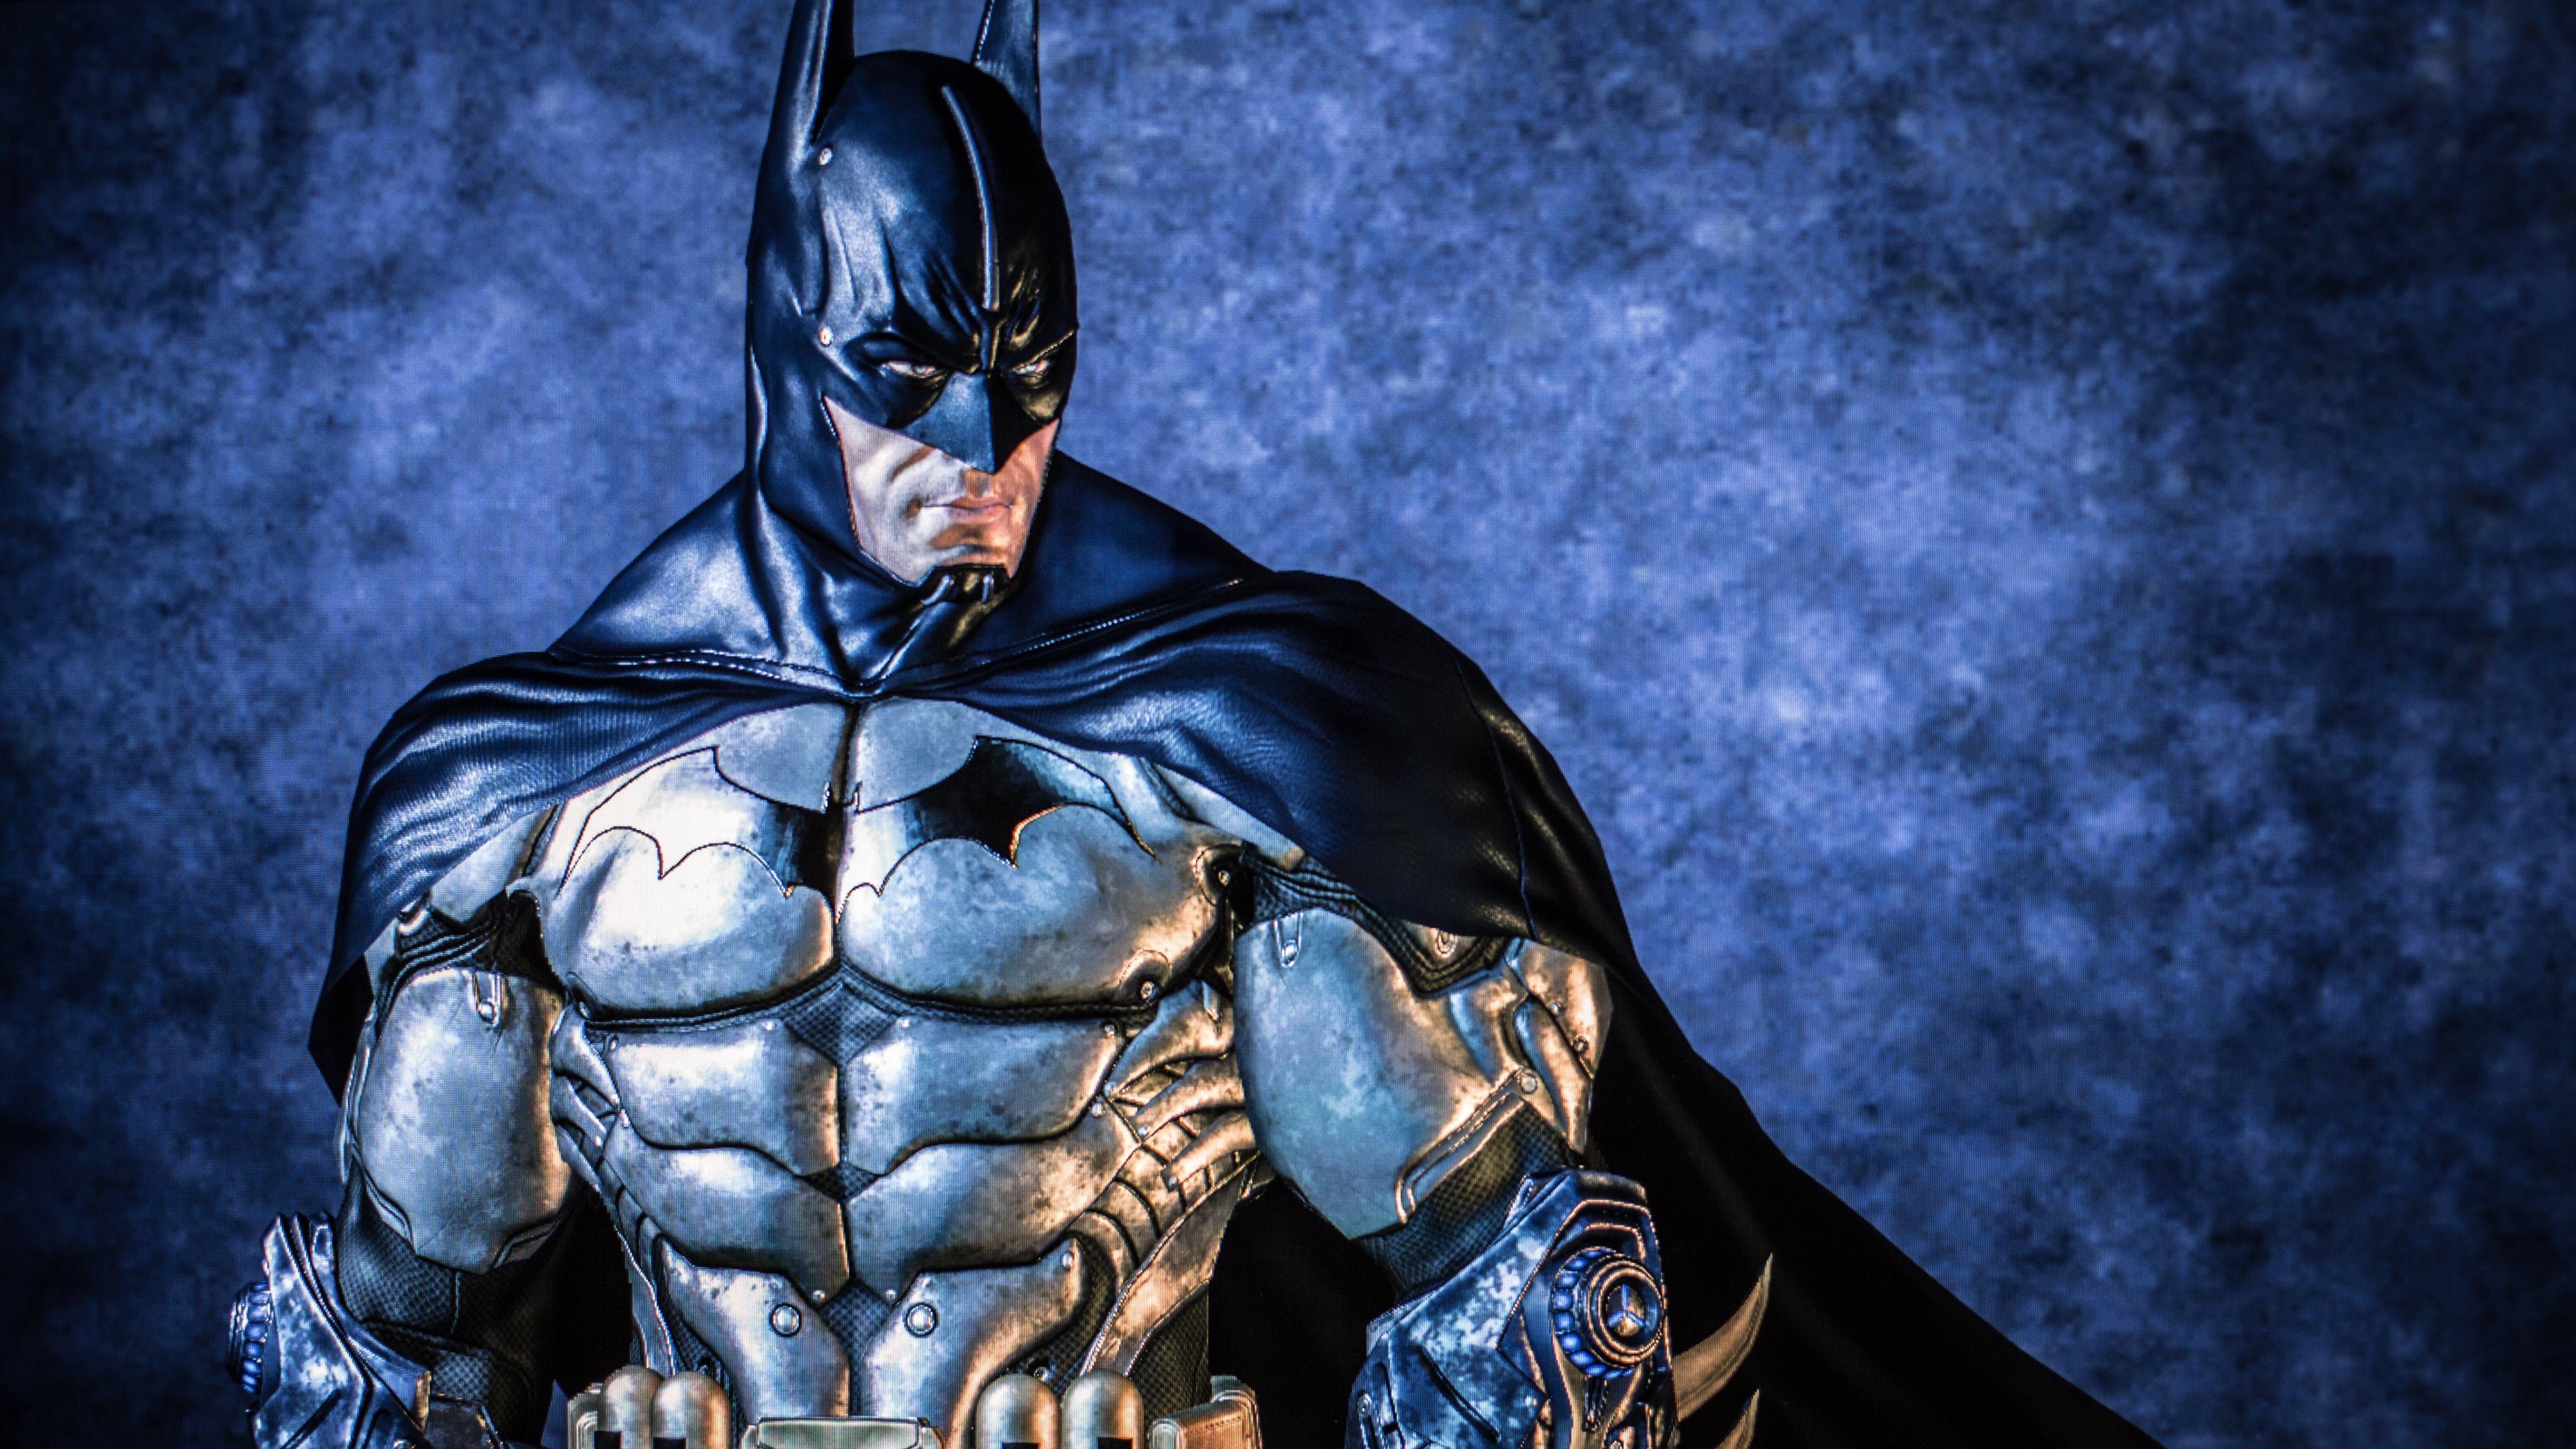 Batman 4k Ultra HD Wallpaper And Background Image